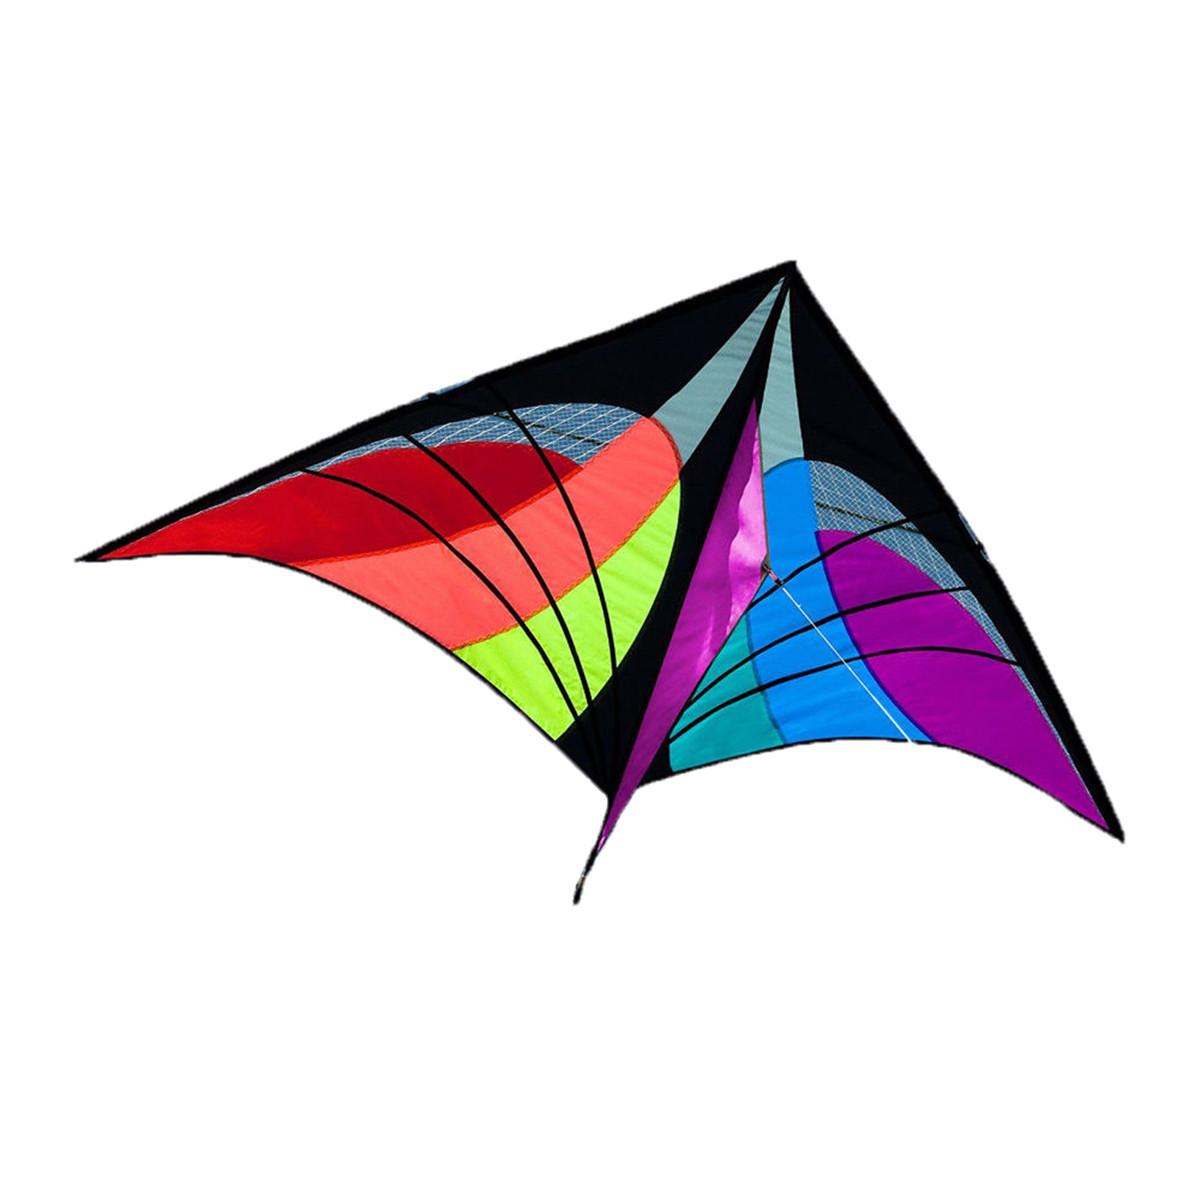 NEW 5.2ft Delta Triangle Kite Outdoor Fun Sports Toys Single Line